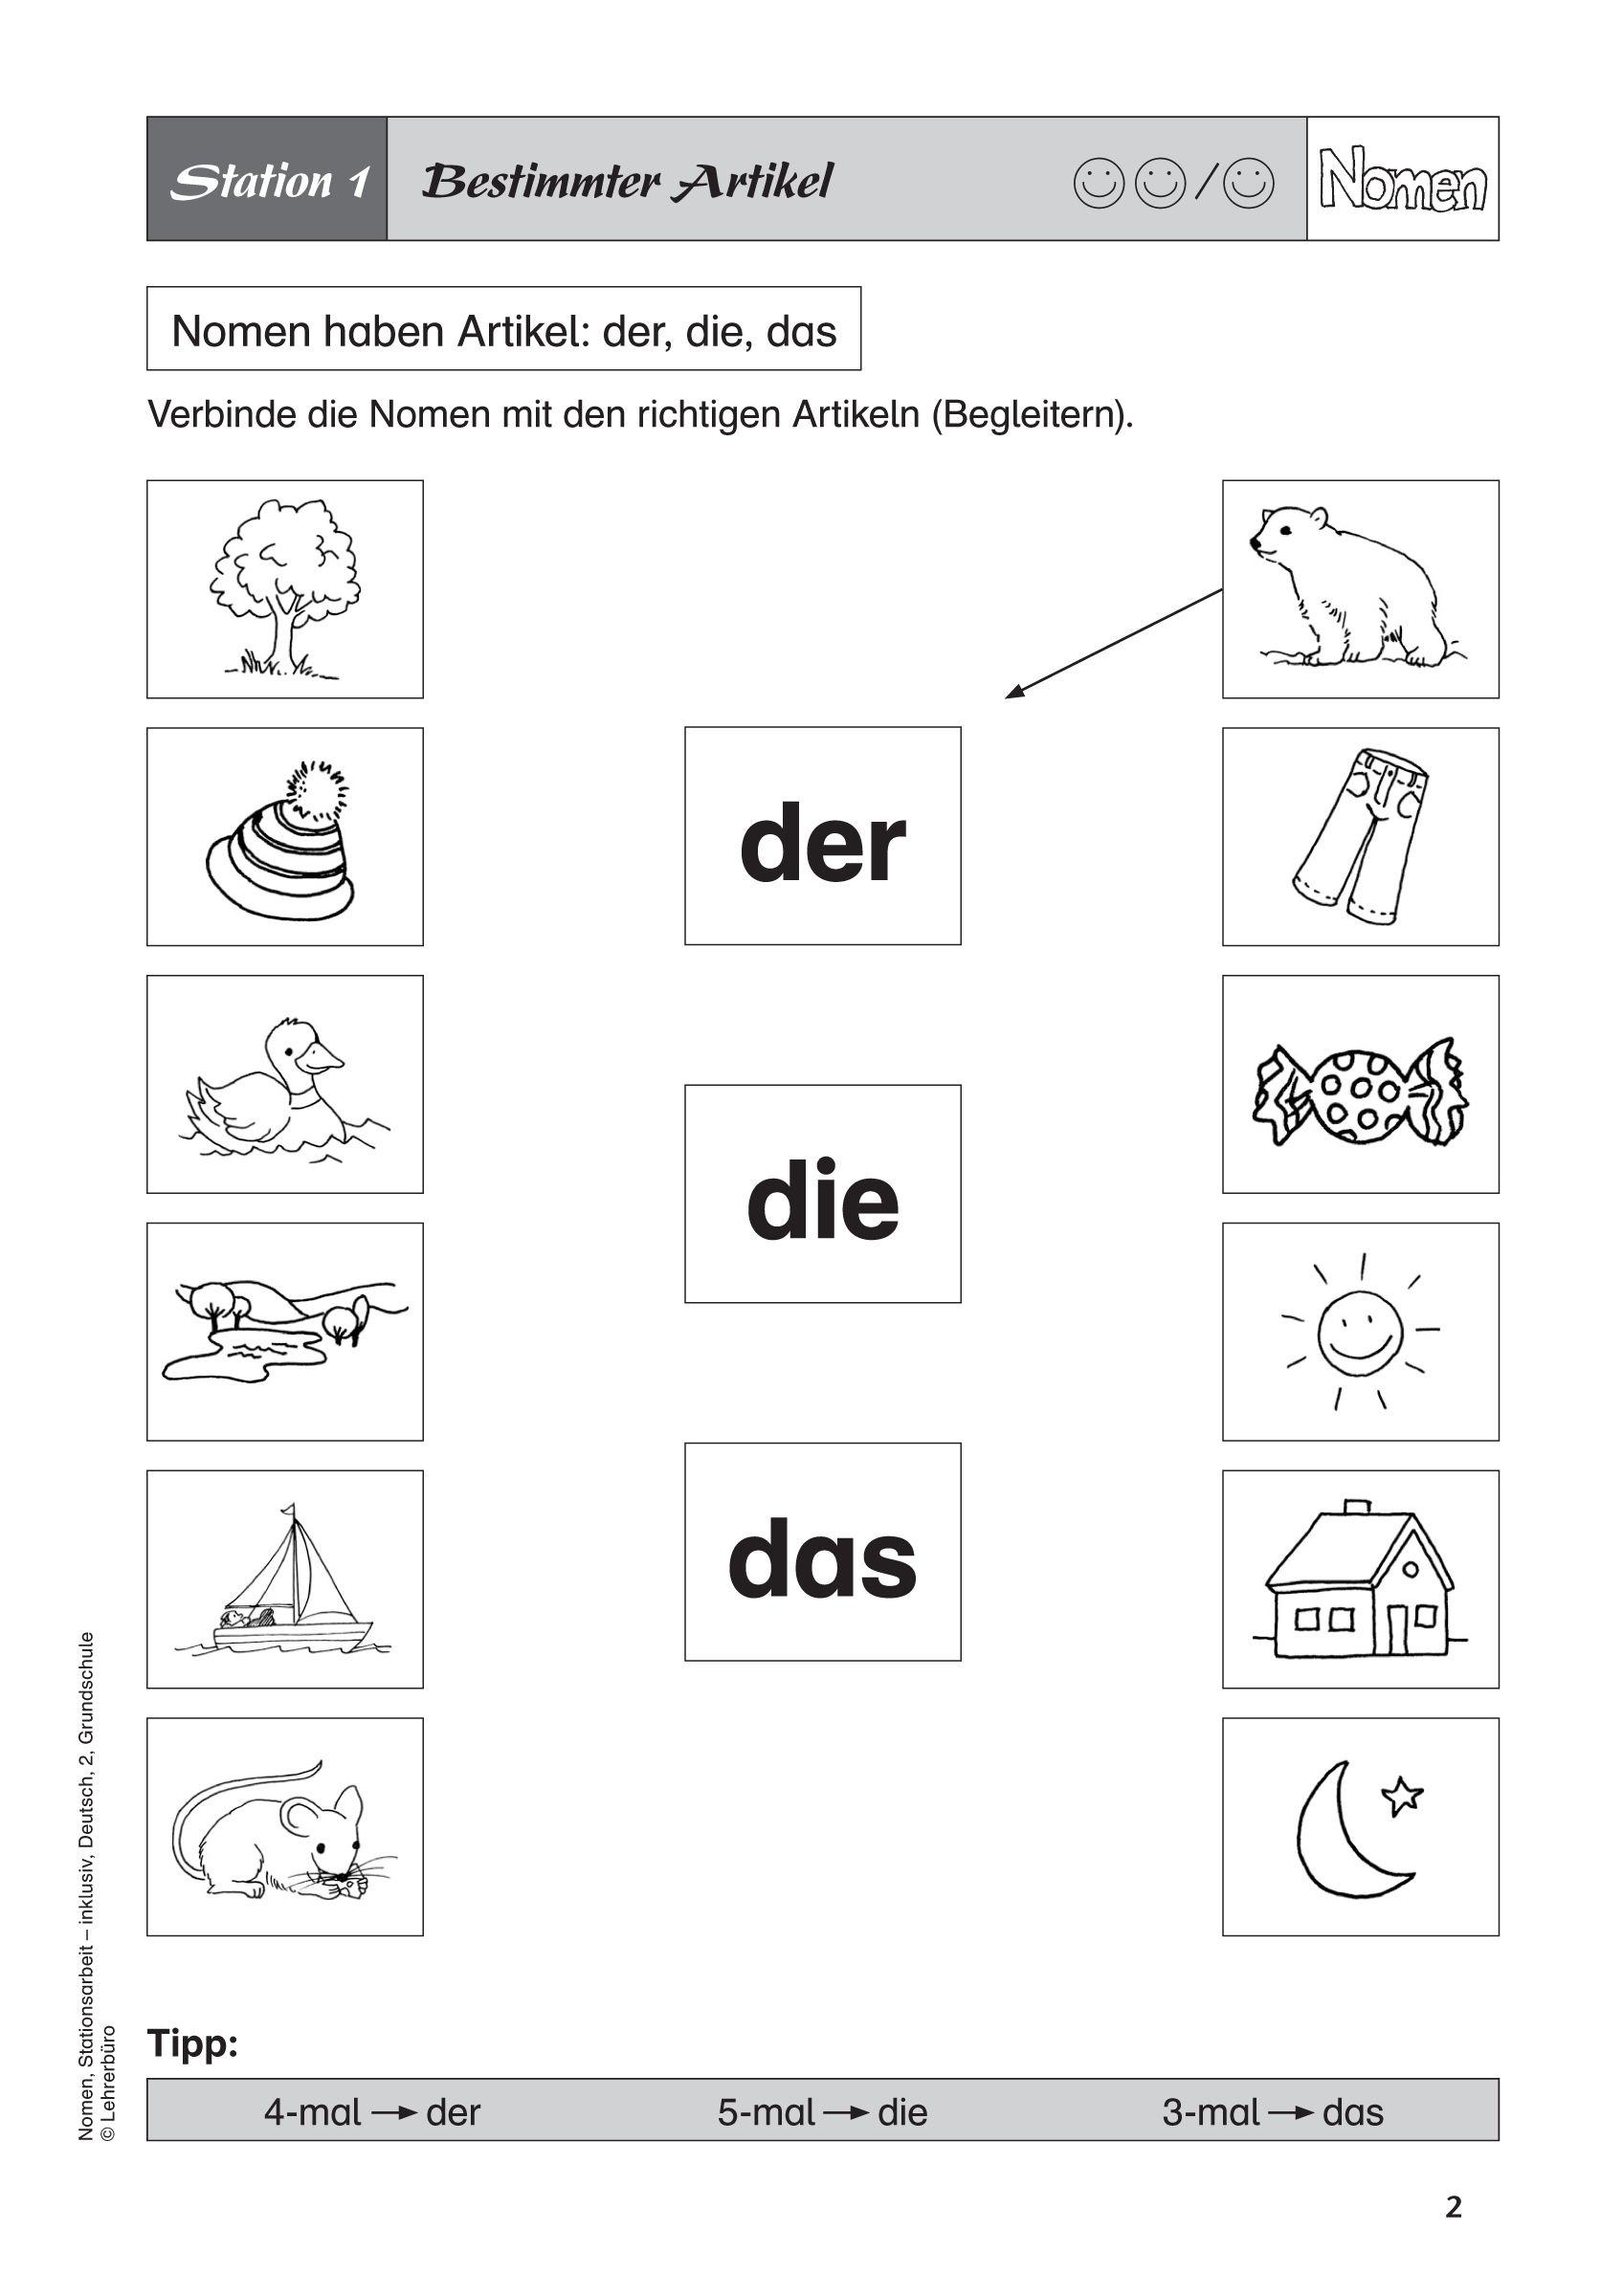 25 arbeitsblatt 5 klasse deutsch nomen schule nomen arbeitsbl tter und deutsch. Black Bedroom Furniture Sets. Home Design Ideas